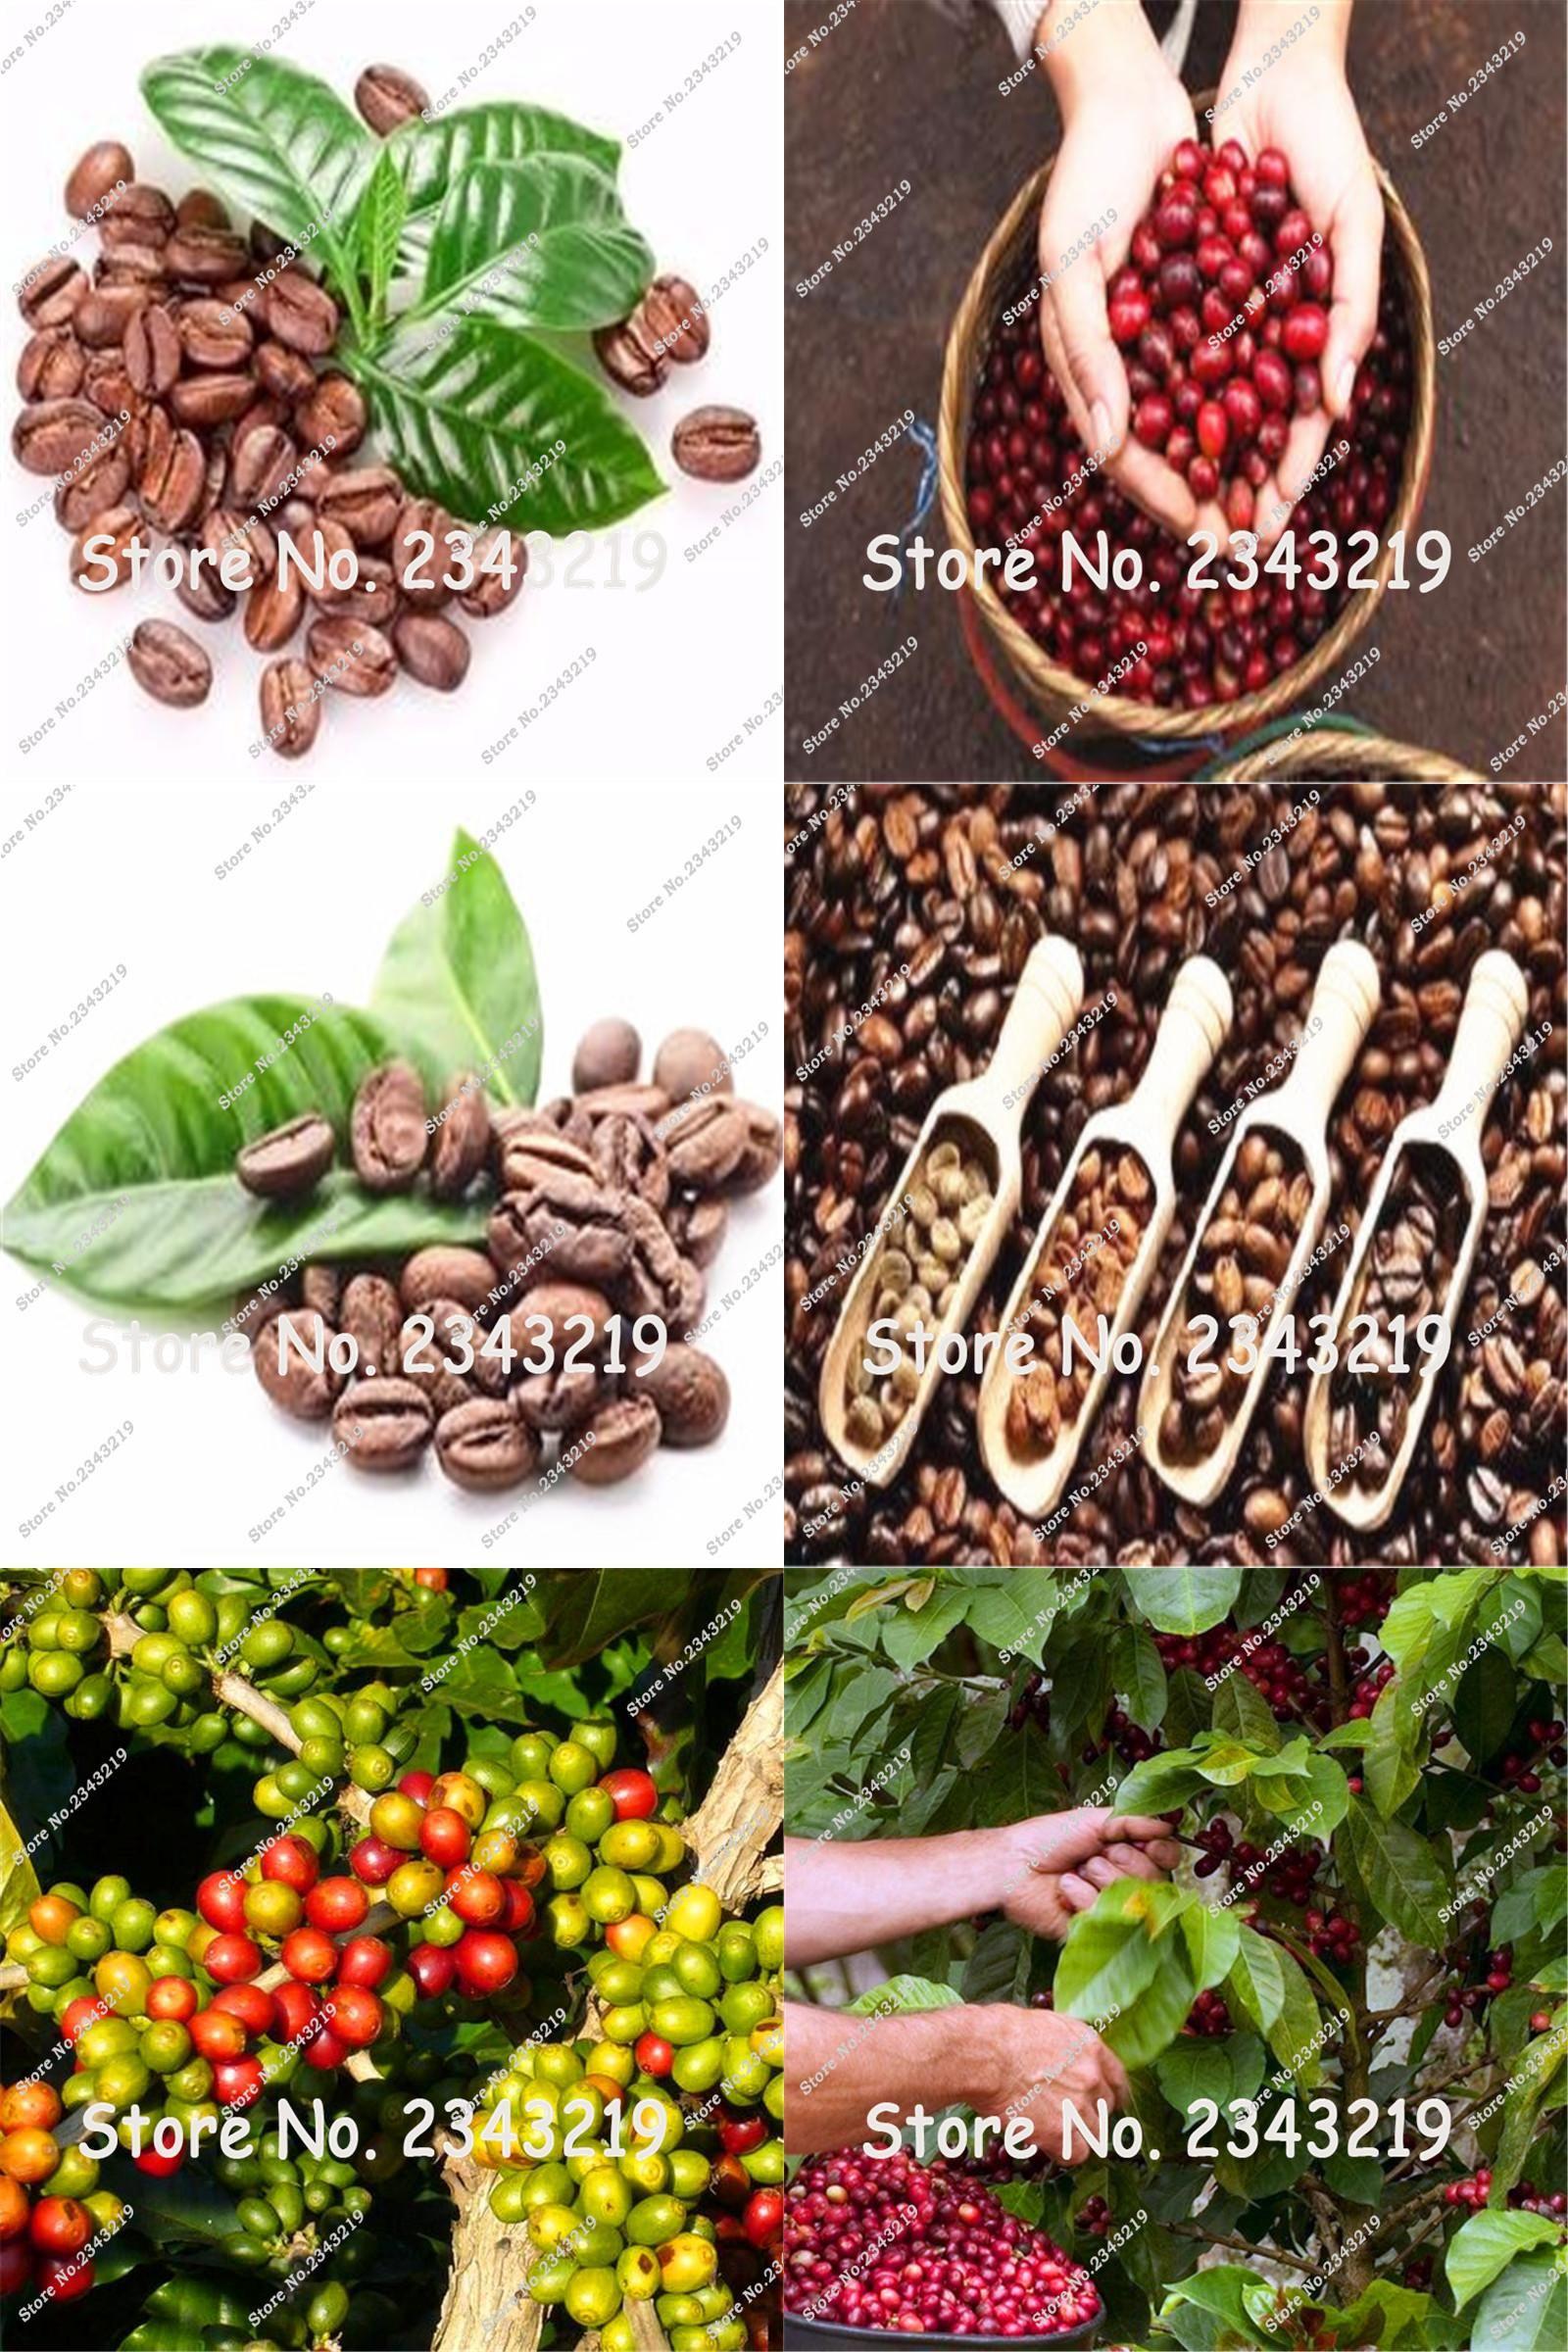 Visit To Buy Coffee Bean Seeds Tropical Bonsai Tree Seeds Perennial Green Vegetable Fruit Coffee Tree Seeds For Ho Natural Coffee Tree Seeds Green Vegetables